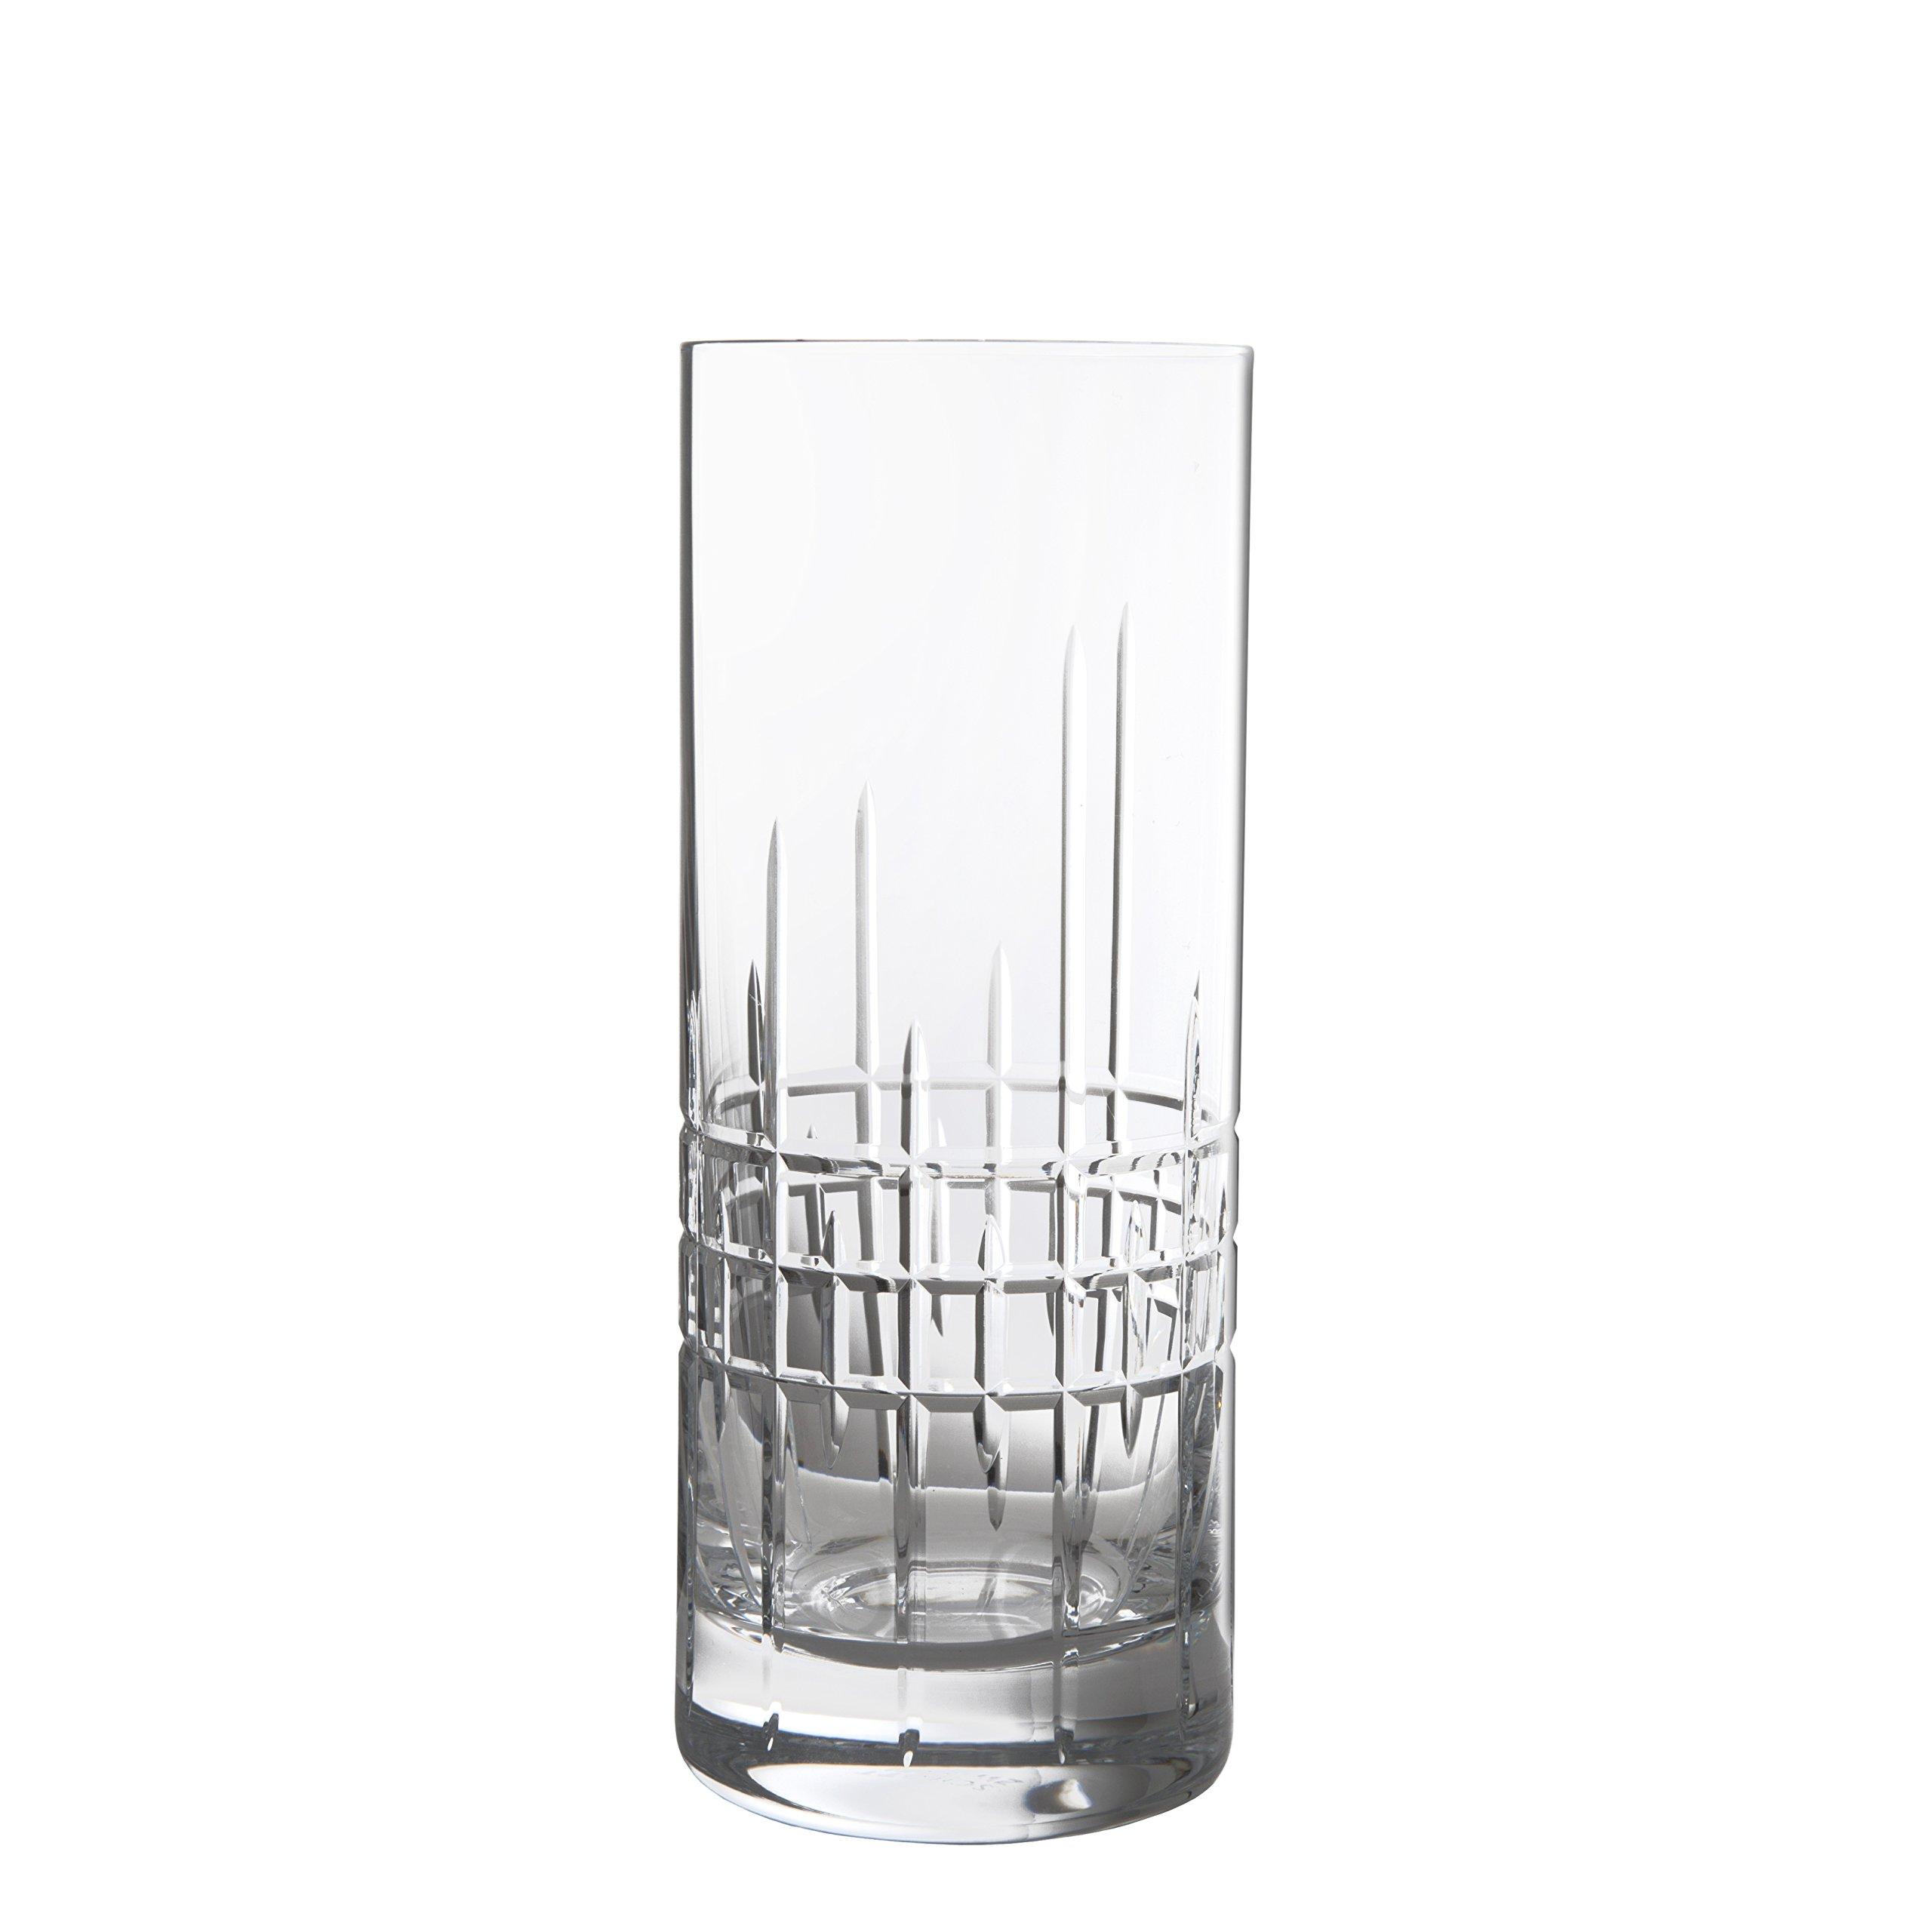 Schott Zwiesel Tritan Crystal Glass Distil Barware Collection Aberdeen Collins Cocktail Glasses (Set of 6), 11.1 oz, Clear